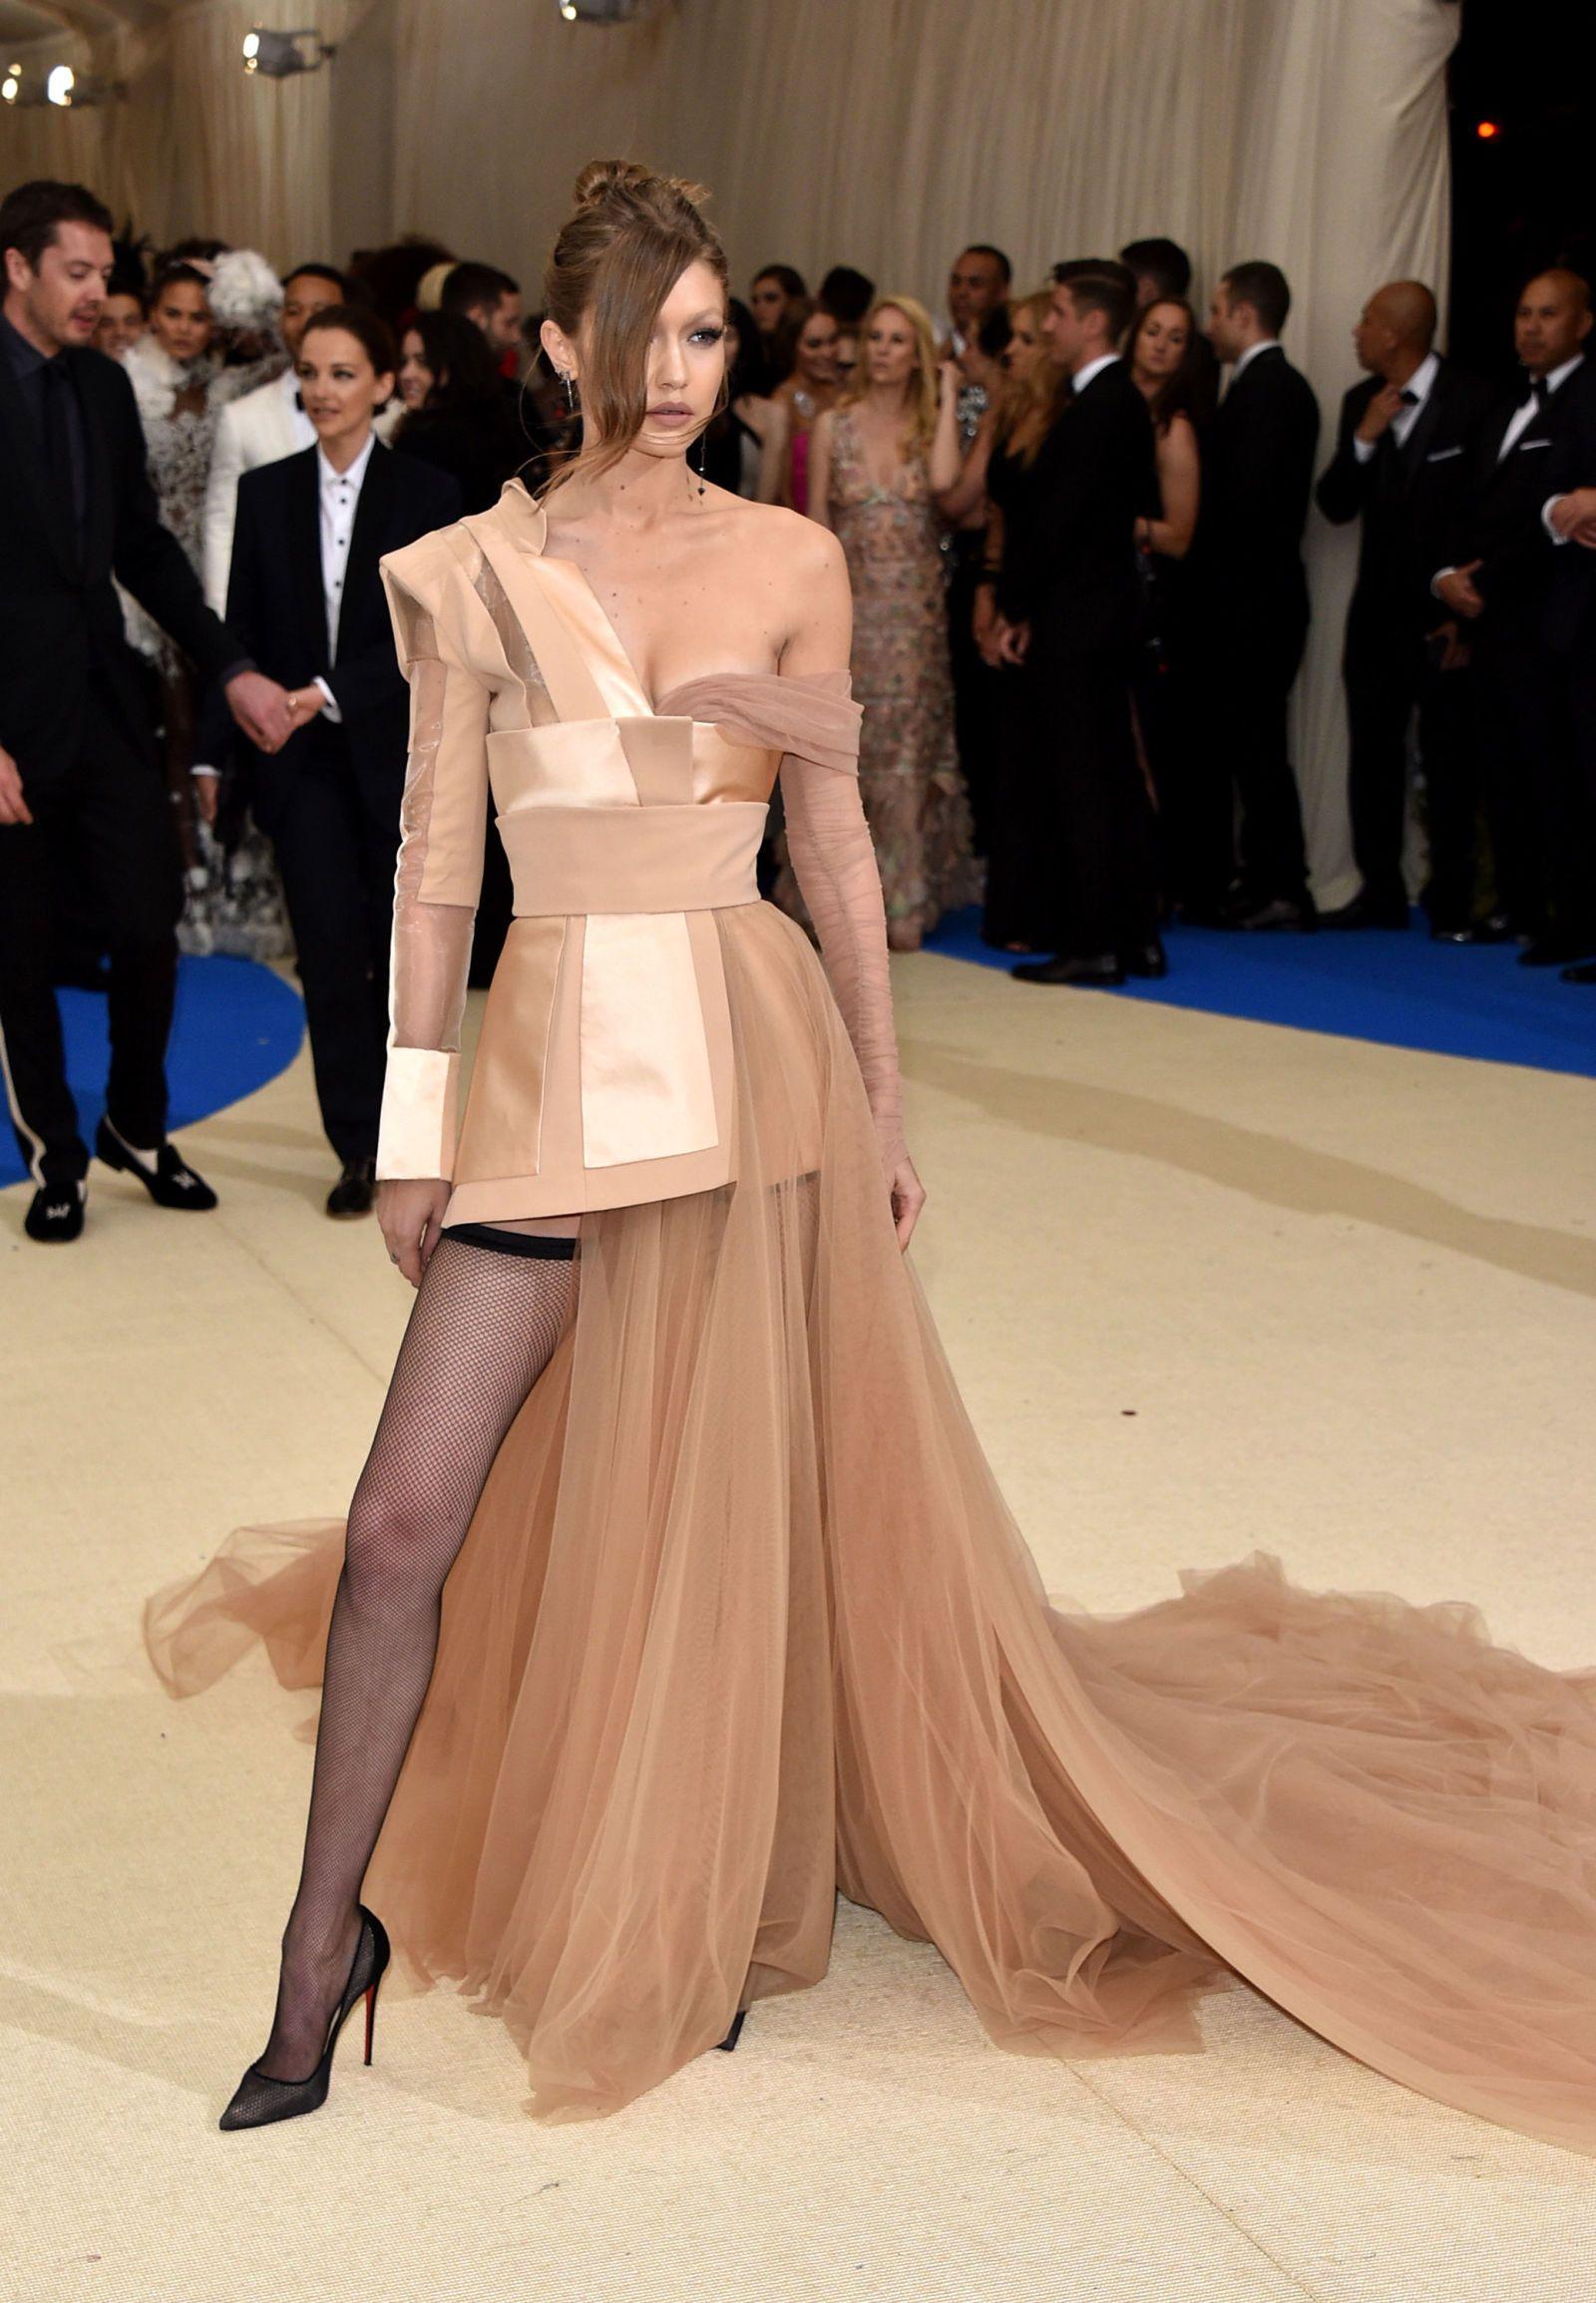 43e9edae099 Gigi Hadid Wears a Nude, Tommy Hilfiger Cinderella Dress to the Met Gala